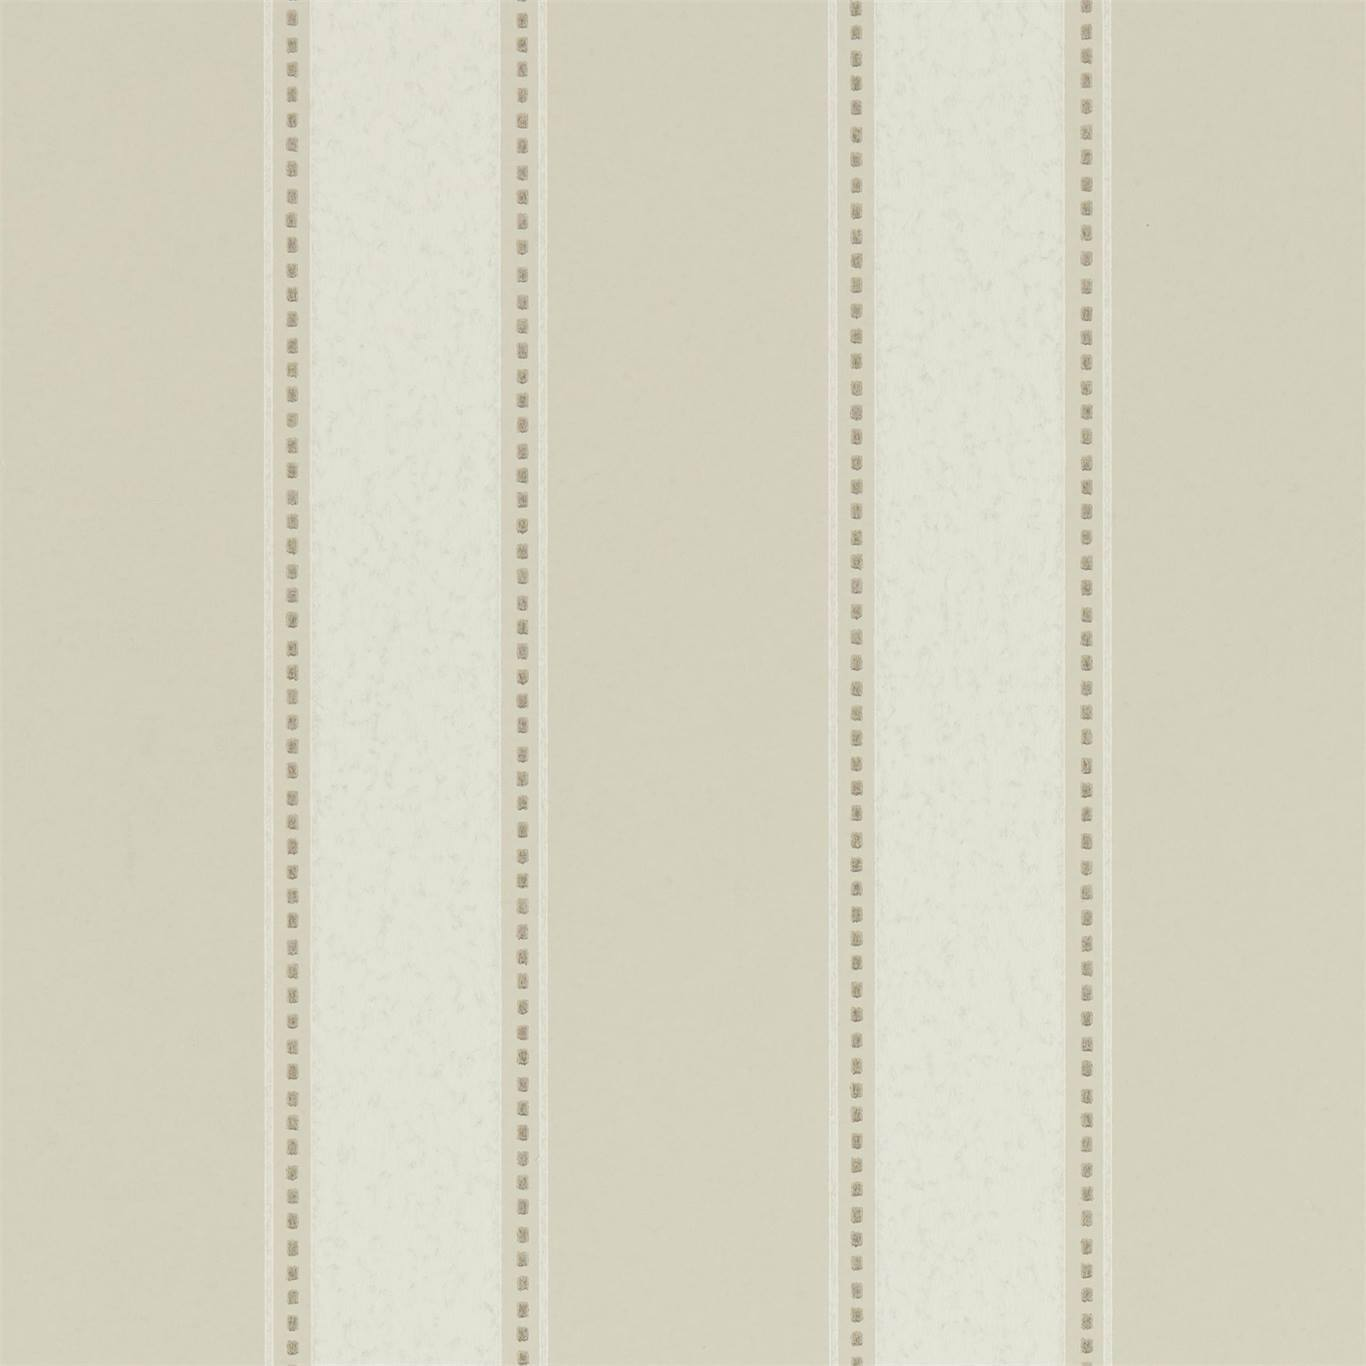 Sonning Stripe by SAN